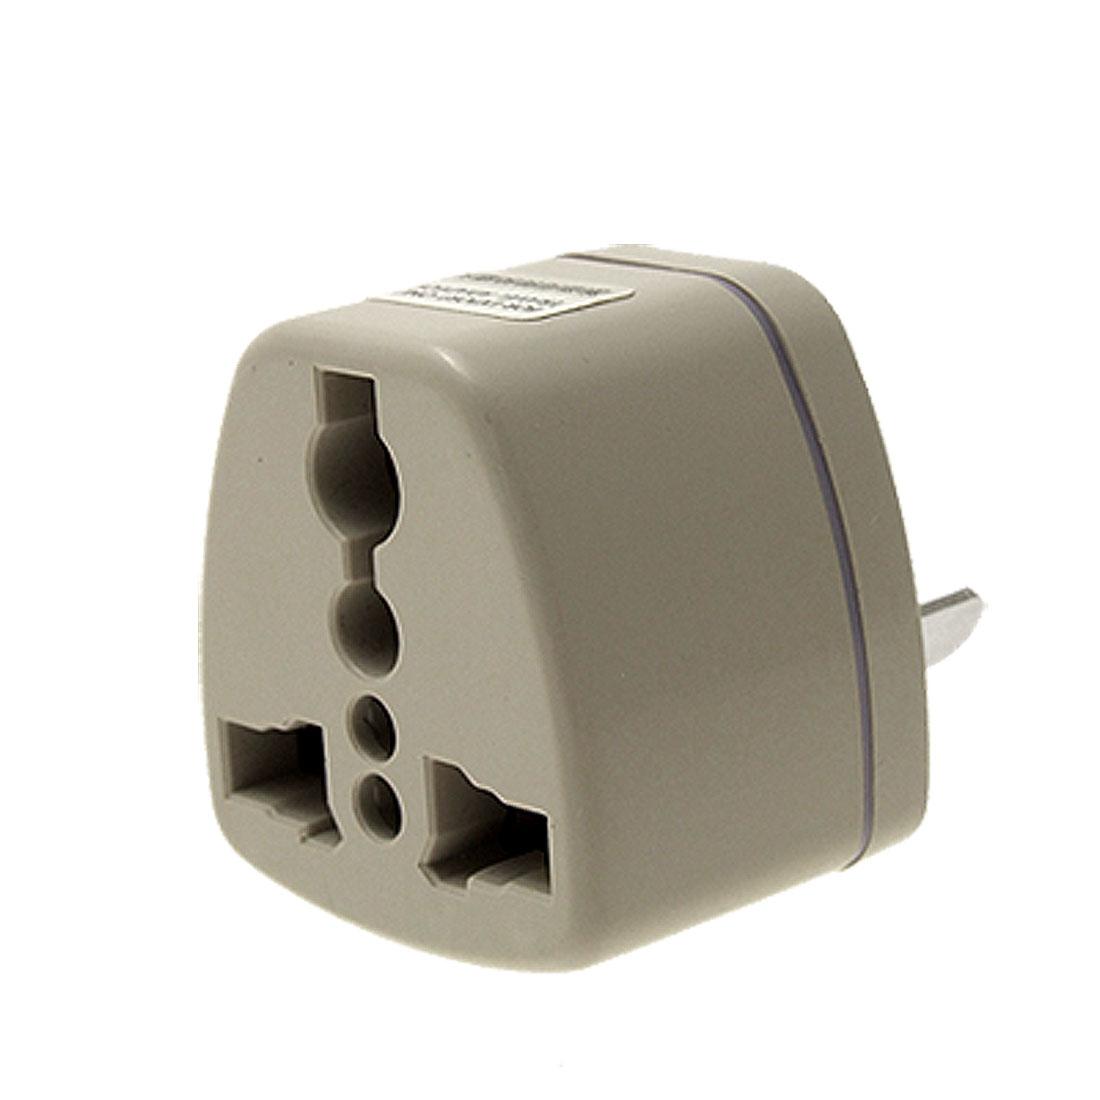 EU US UK to 2 Pin AU AC Plug Adapter Travel Converter 250VAC